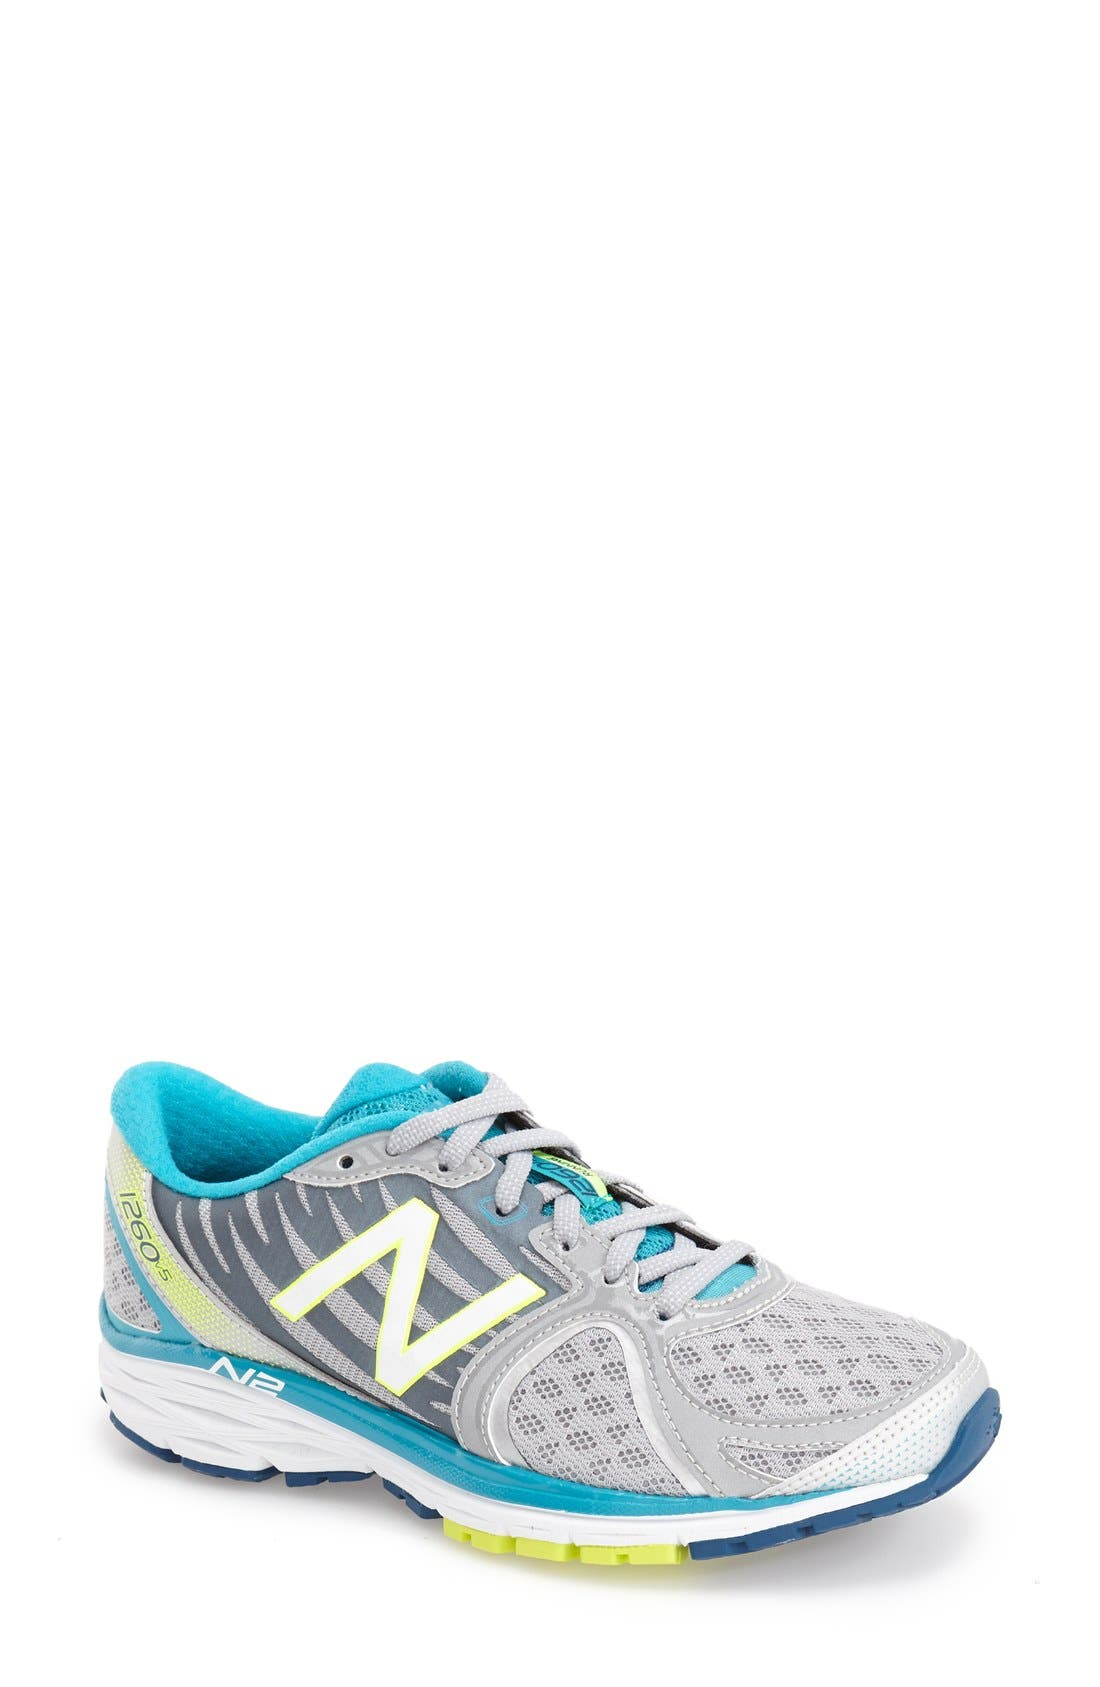 1260 v5' Running Shoe, Main, color, 041